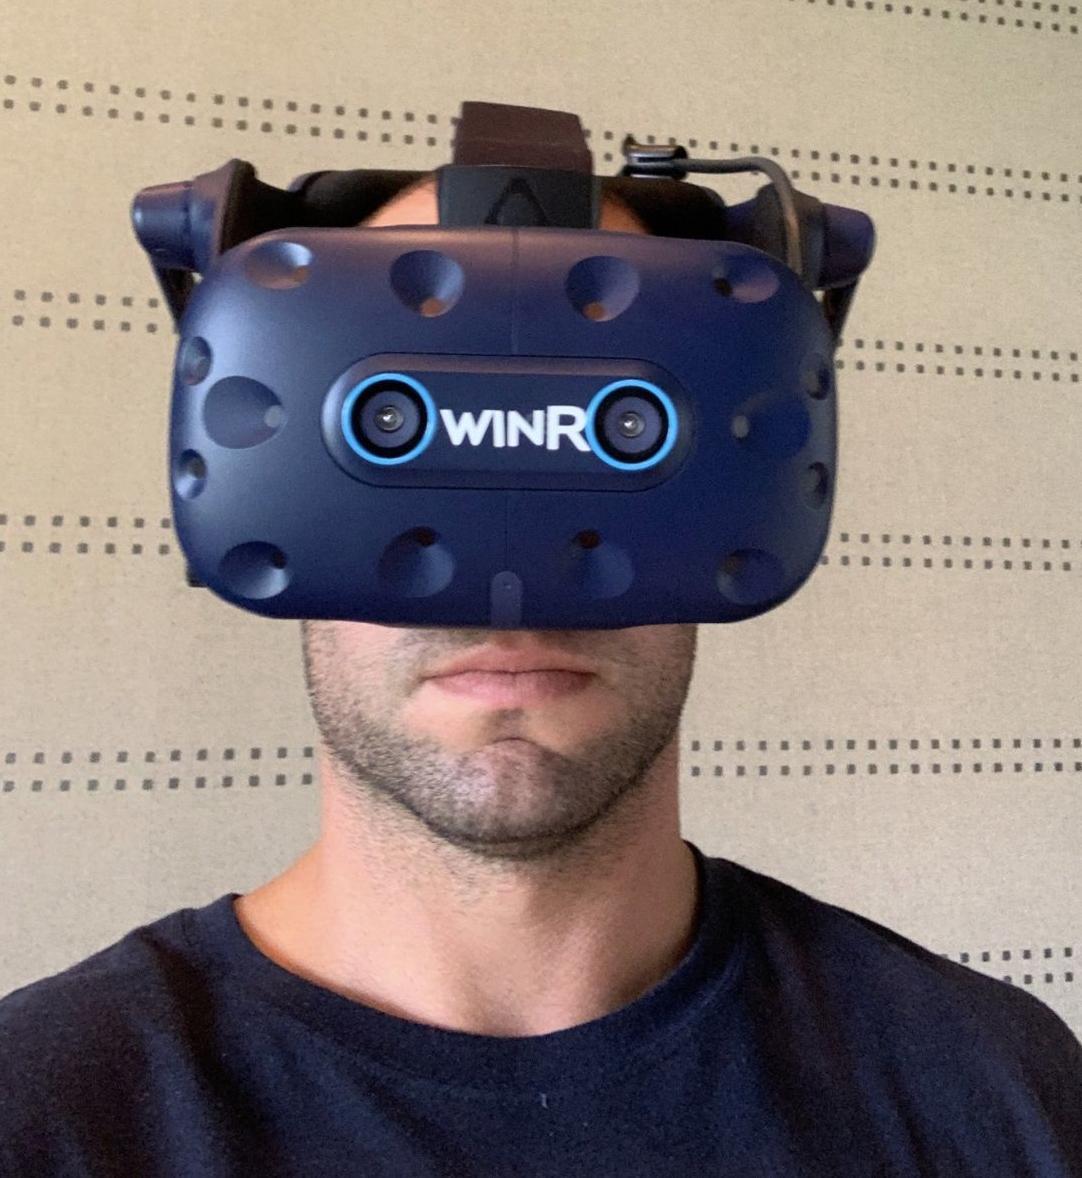 Cardinals first baseman Paul Goldschmidt wears WIN Reality headset